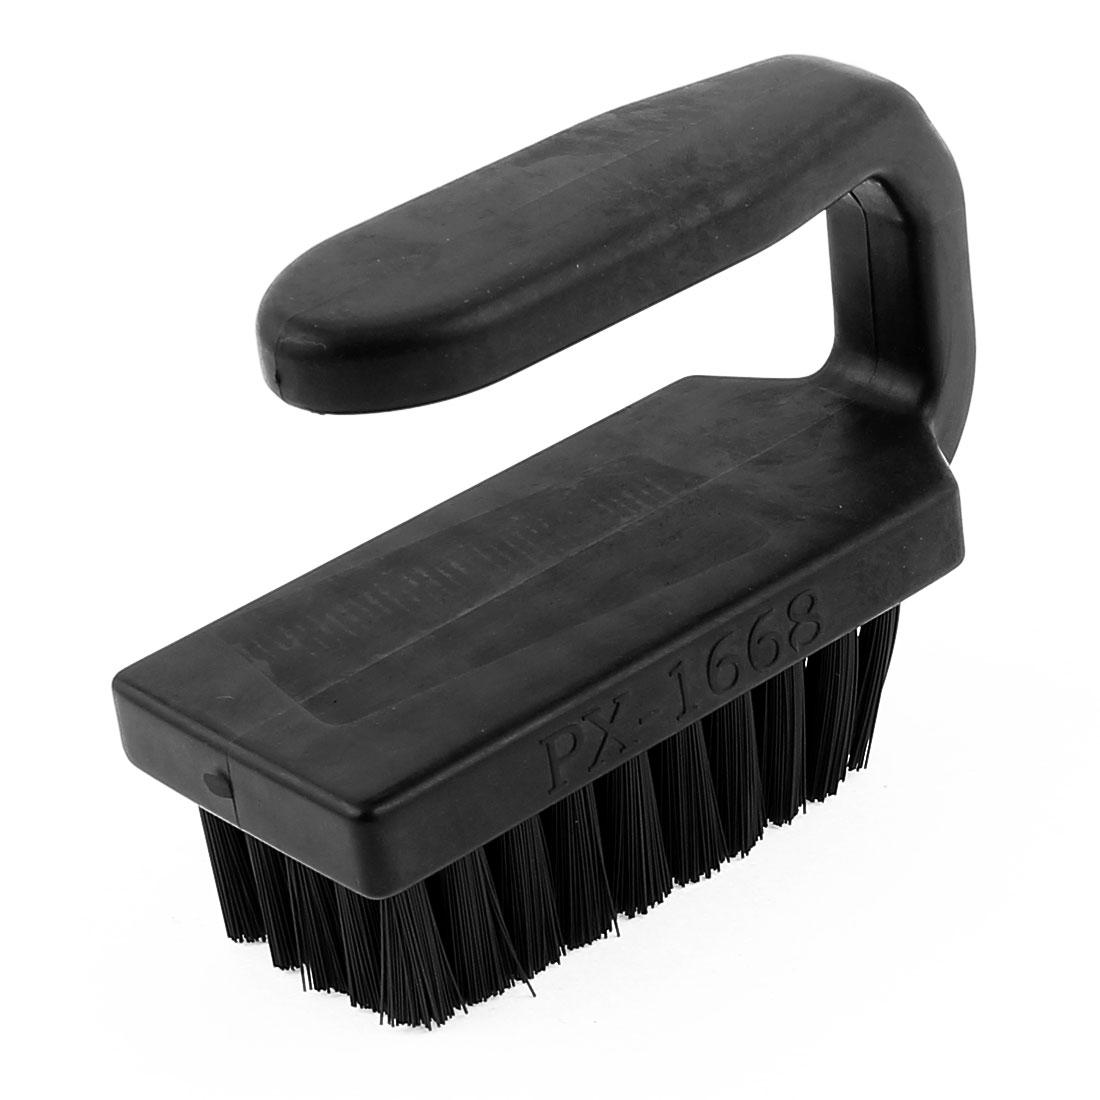 95 x 70 x 40mm Black U Shape Plastic Handle PCB Circuit Board Anti Static Brush